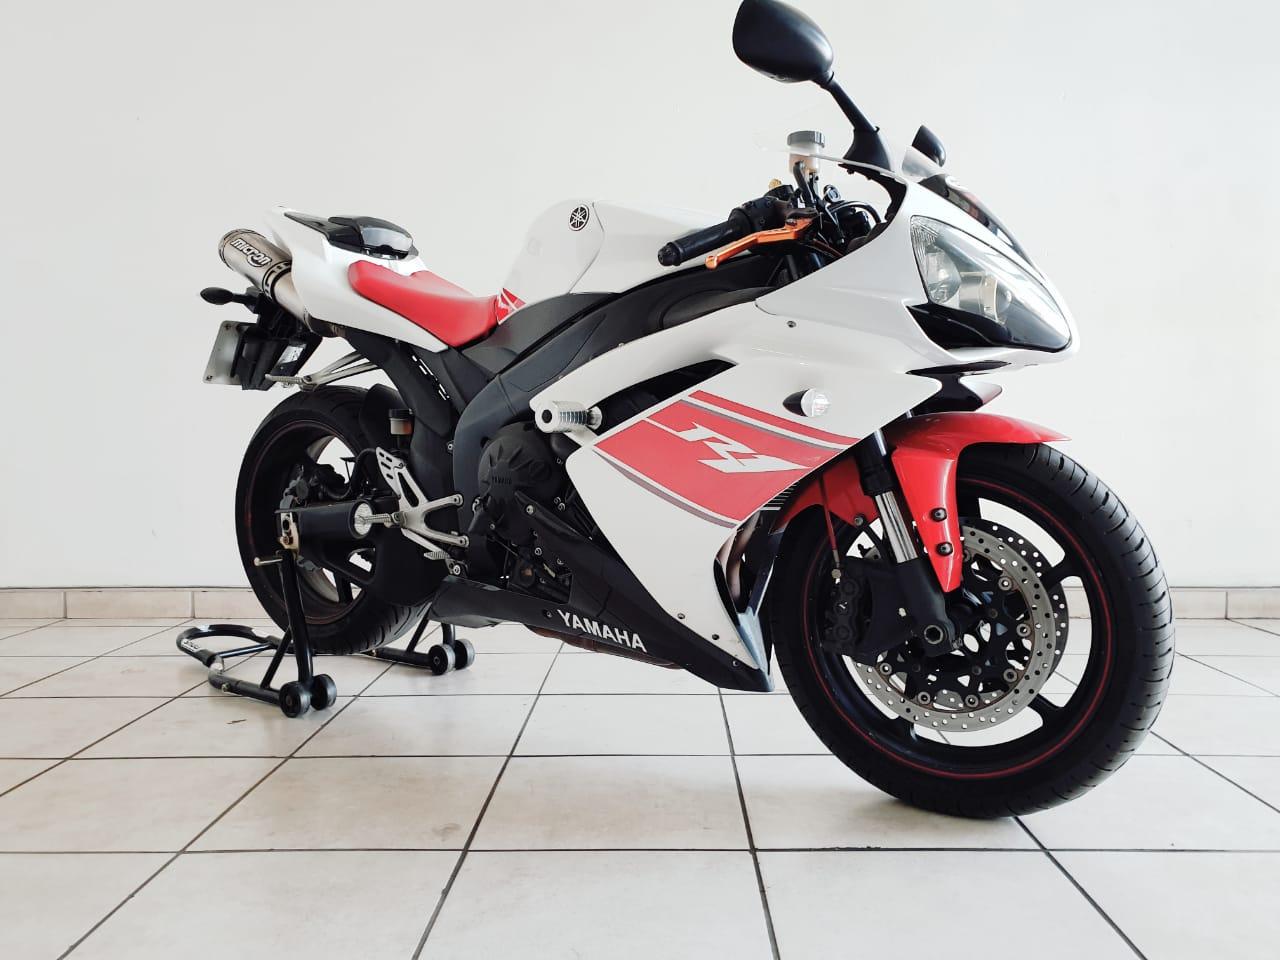 2008 Yamaha YZF R1